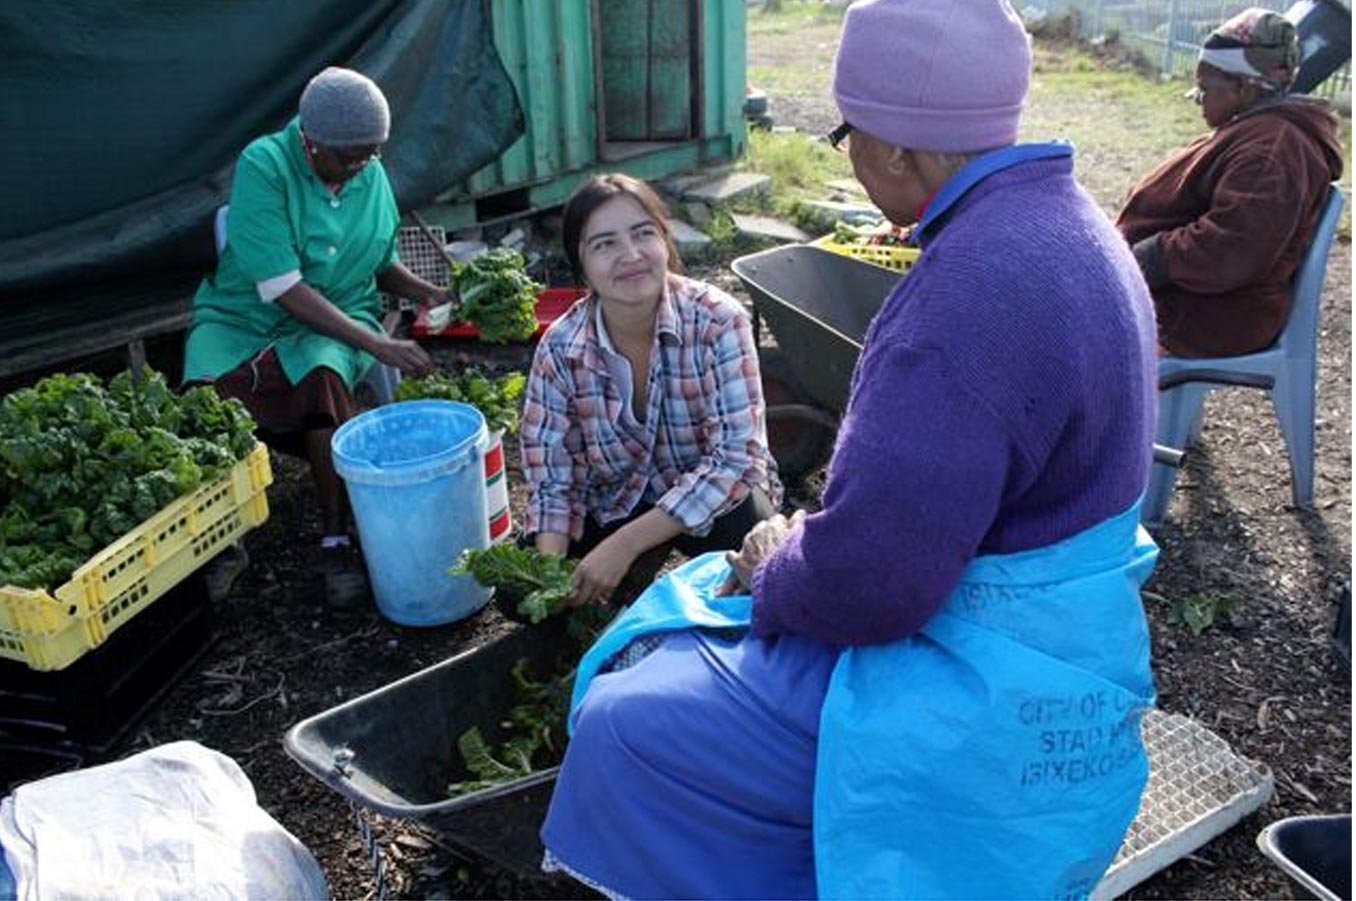 Fizeka Mamas -  a community garden project